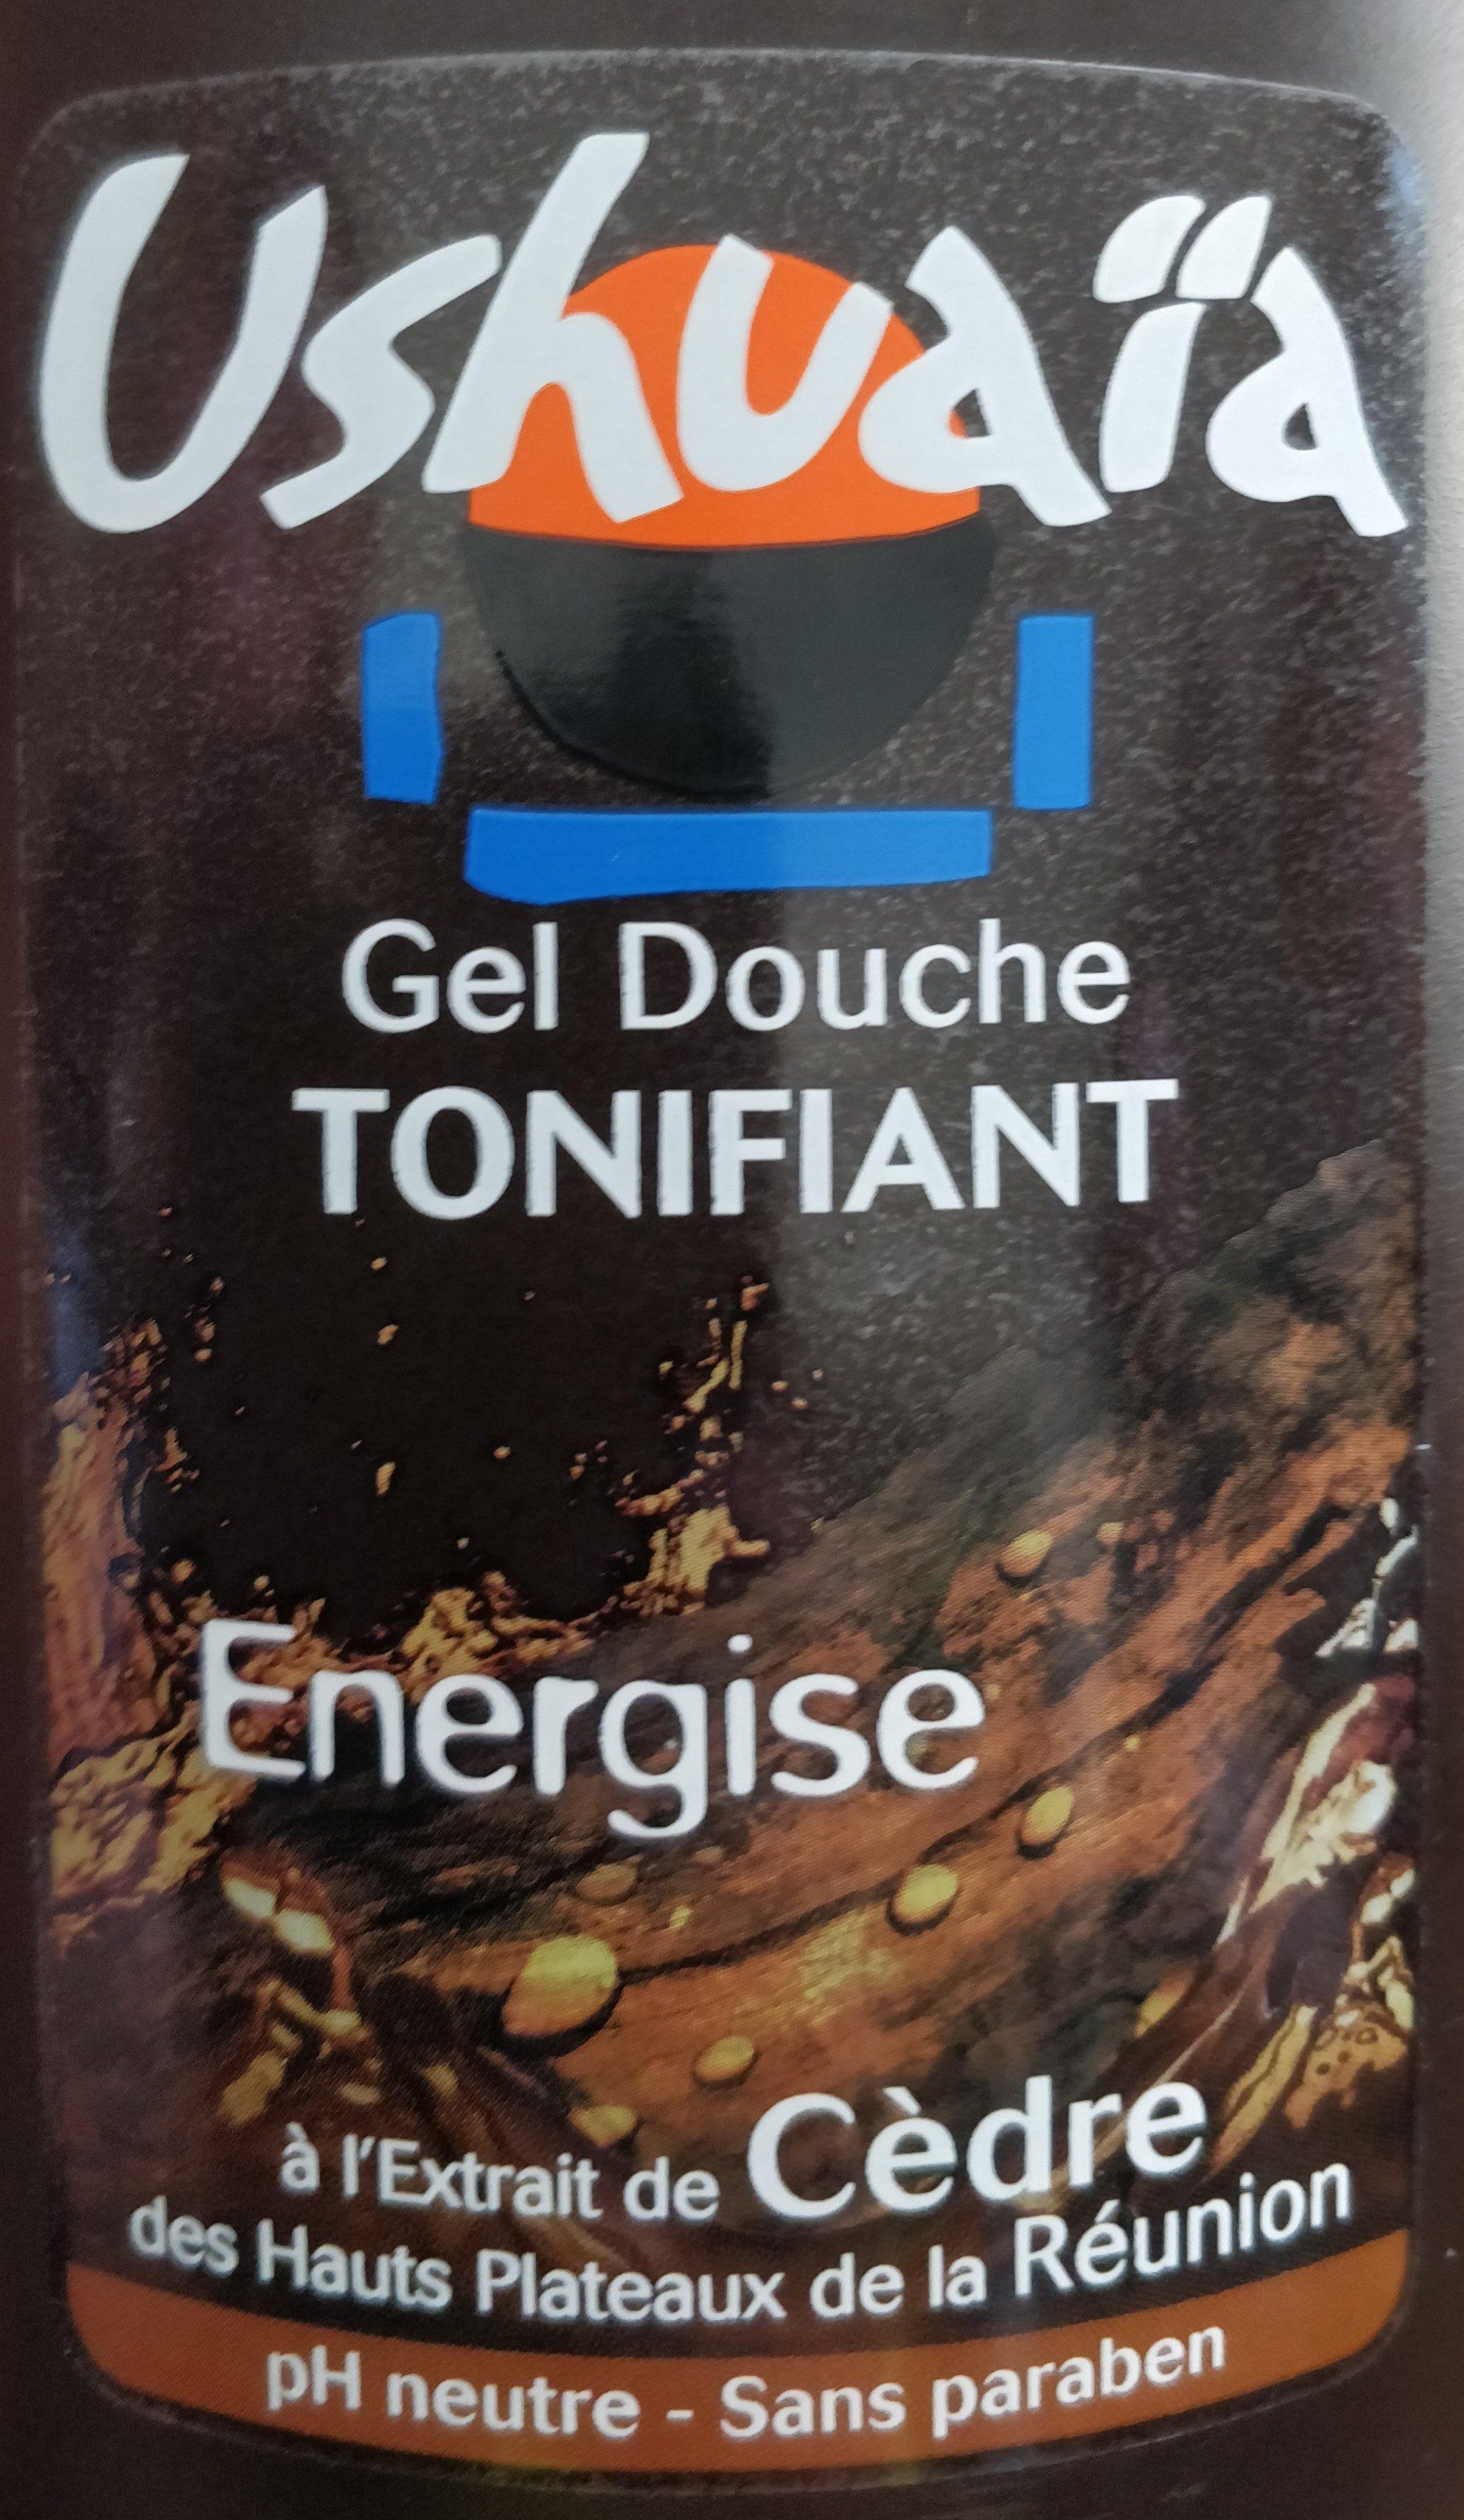 gel douche tonifiant Energise - Product - fr